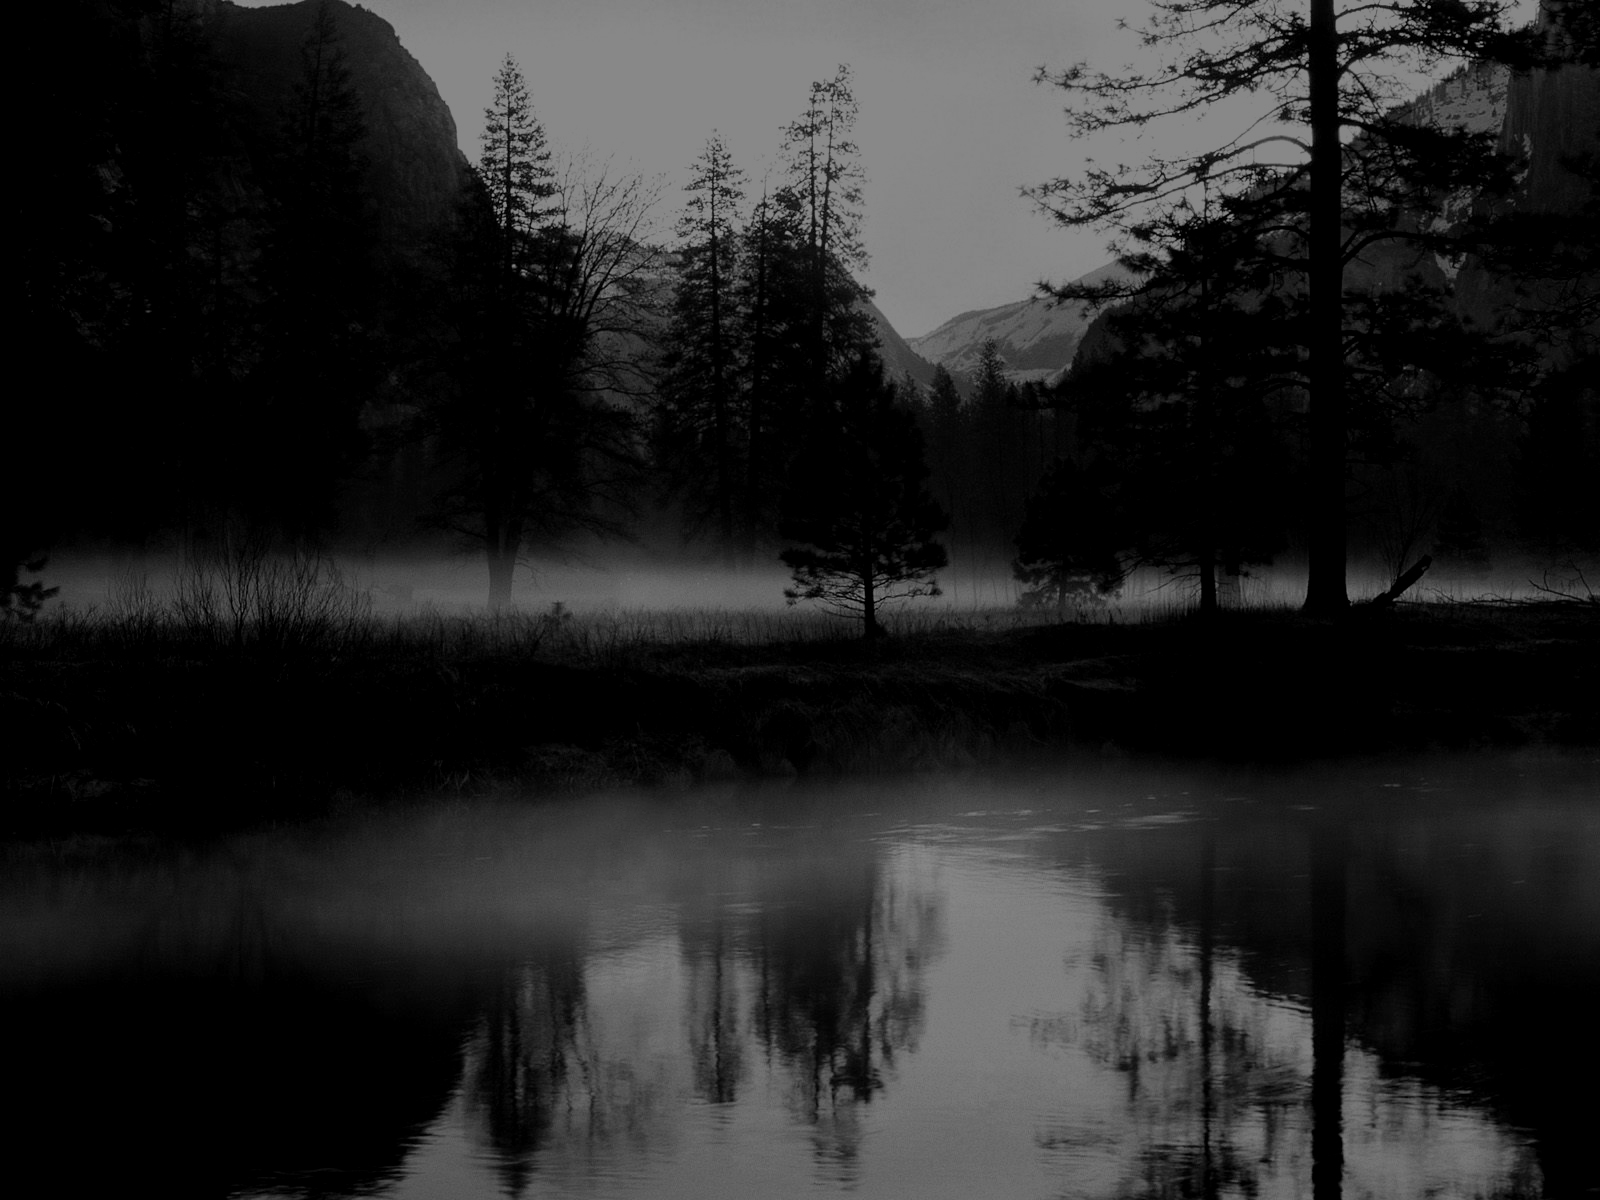 Abstract Dark Nature HD Wallpapers – wallpaper202